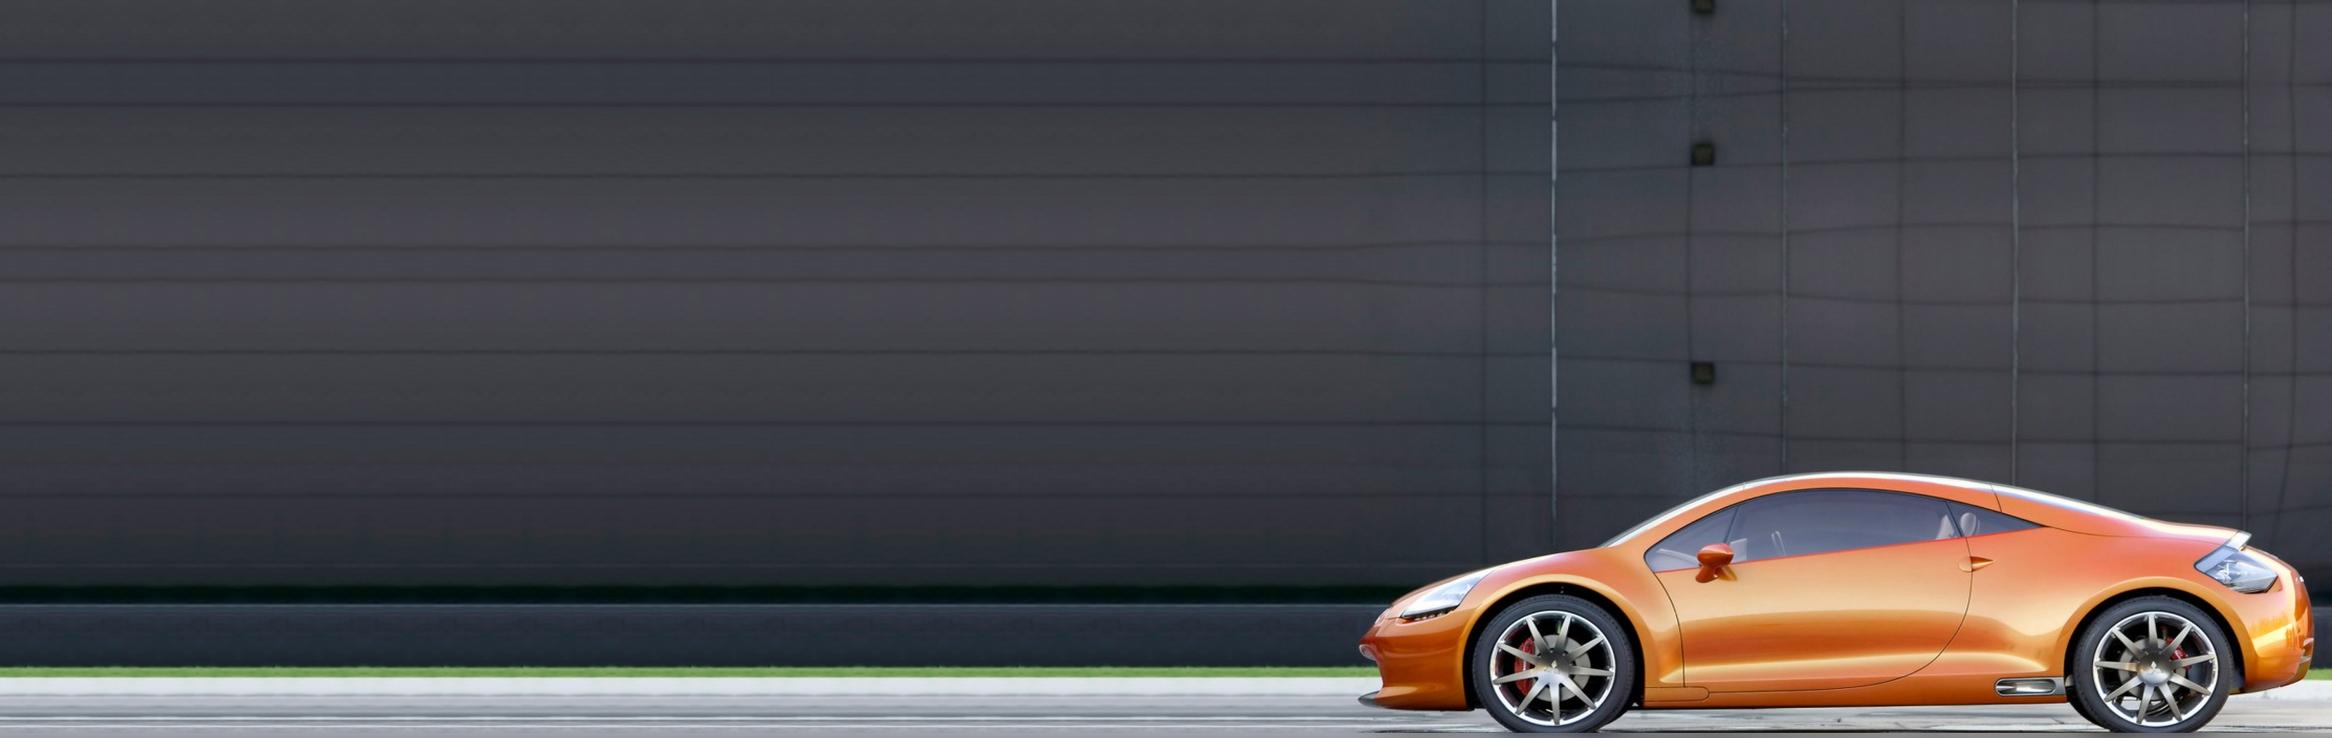 Automotive Monitoring